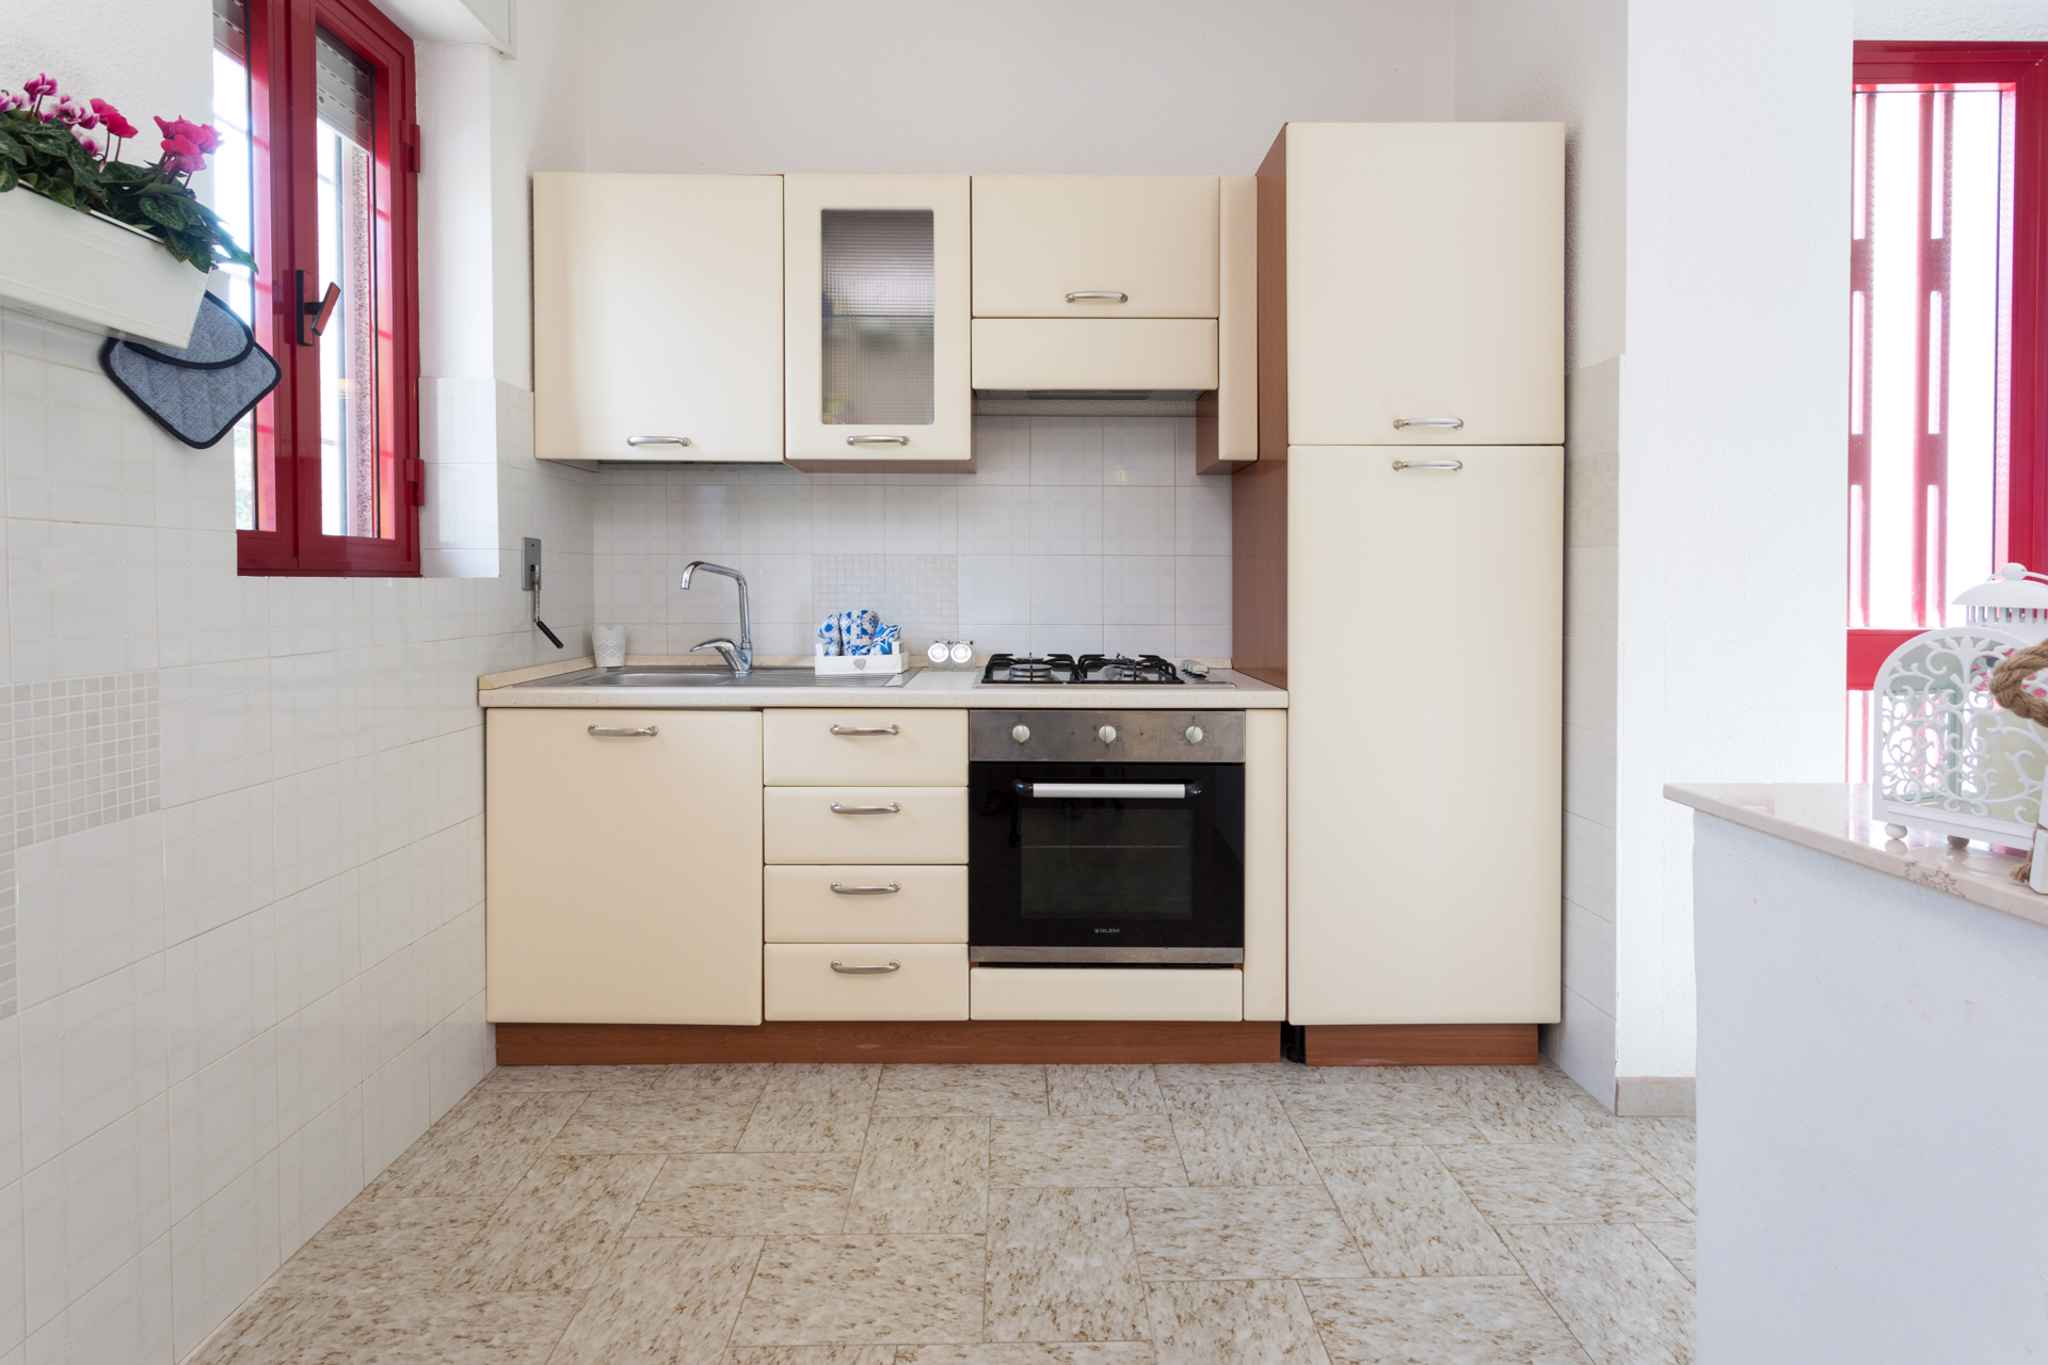 Ferienhaus Vicino Al Mare (560014), Alliste, Lecce, Apulien, Italien, Bild 10